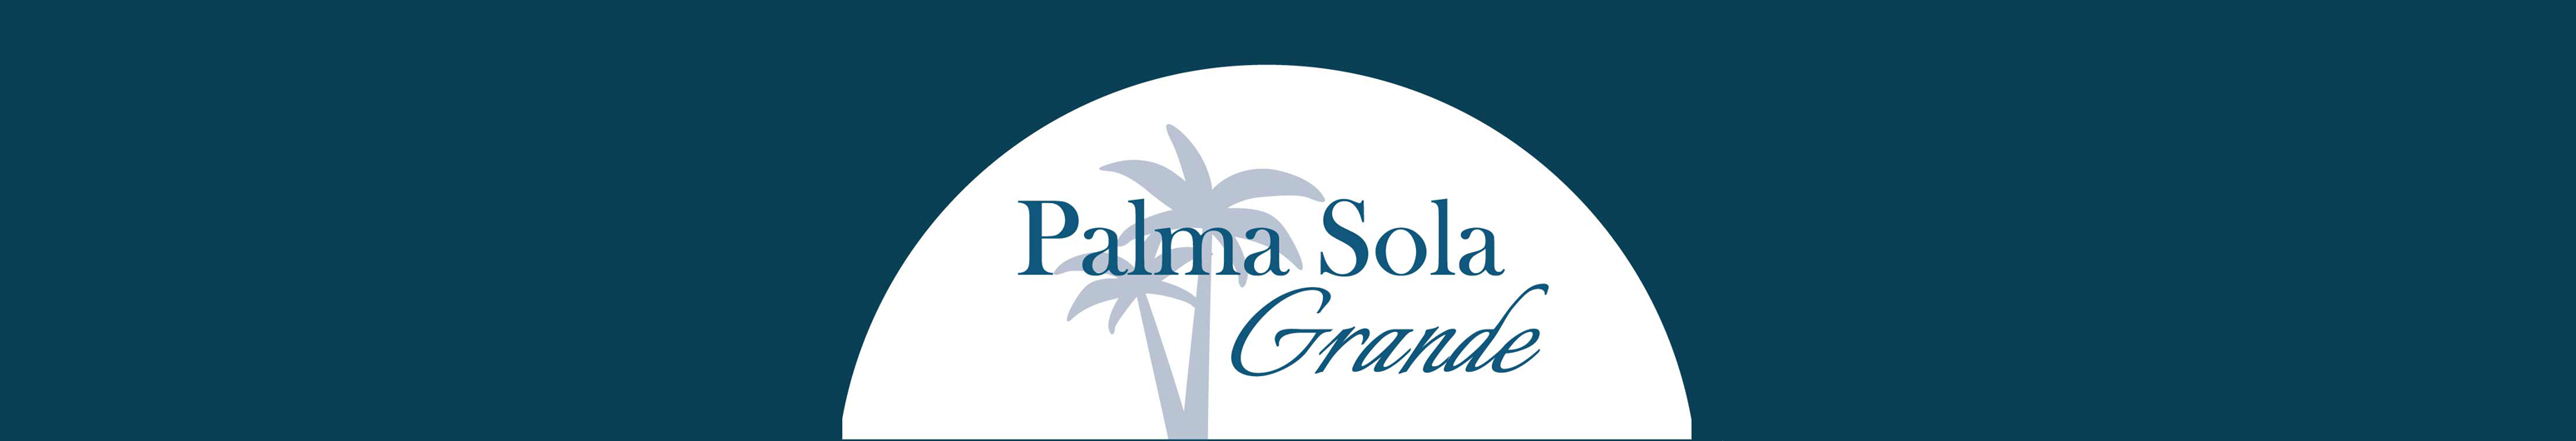 Palma Sola Grande